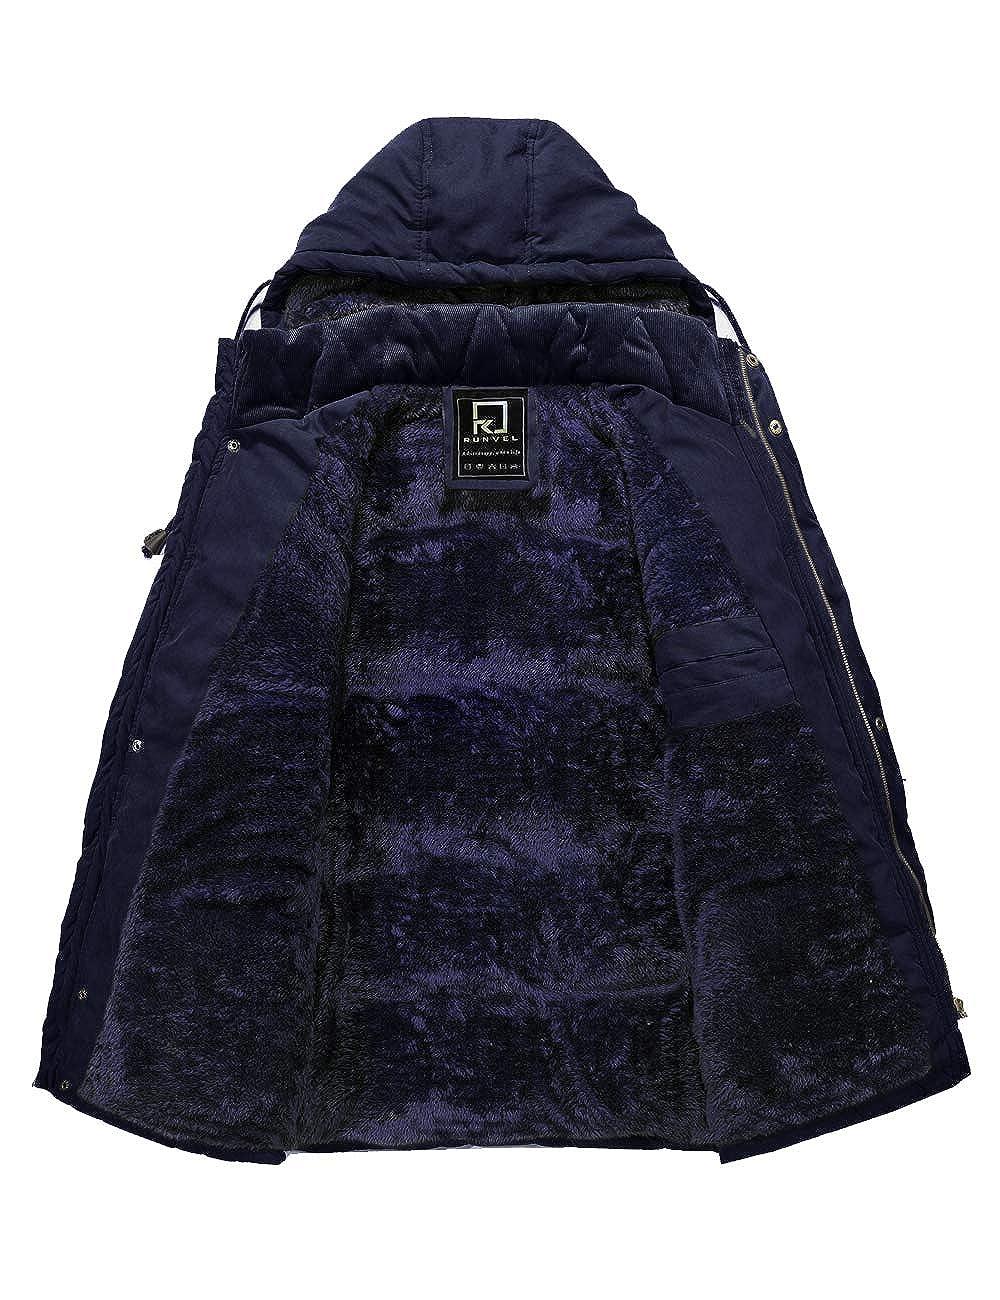 R RUNVEL Parka Jacket Mens Coats with Fur Hood Winter Warm Outwear Coat